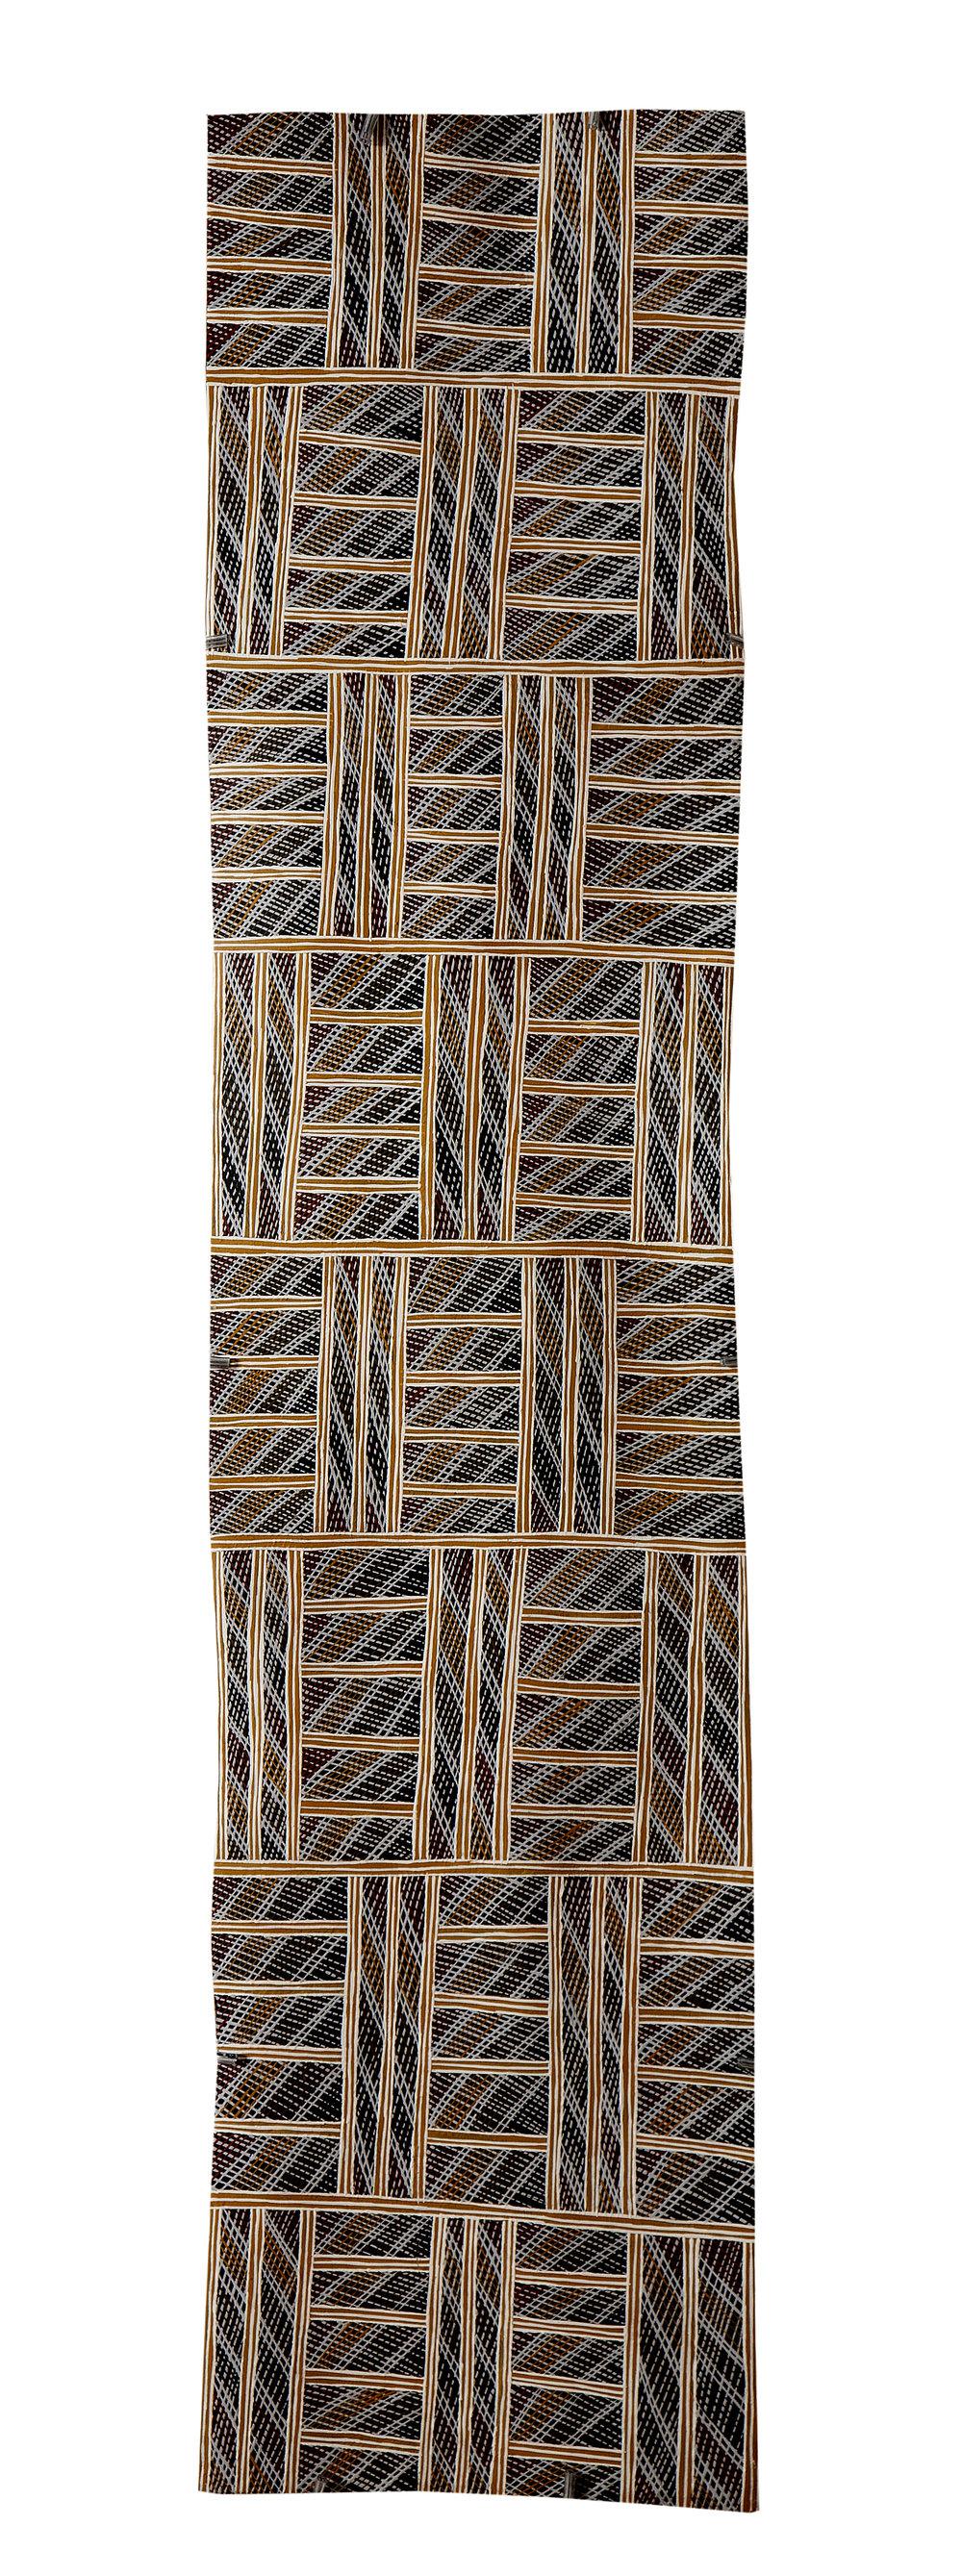 Djurrayun Murrinyina   Untitled  Natural earth pigments on bark 116 x 26 cm Buku Larrnggay Mulka #4061U   EMAIL INQUIRY